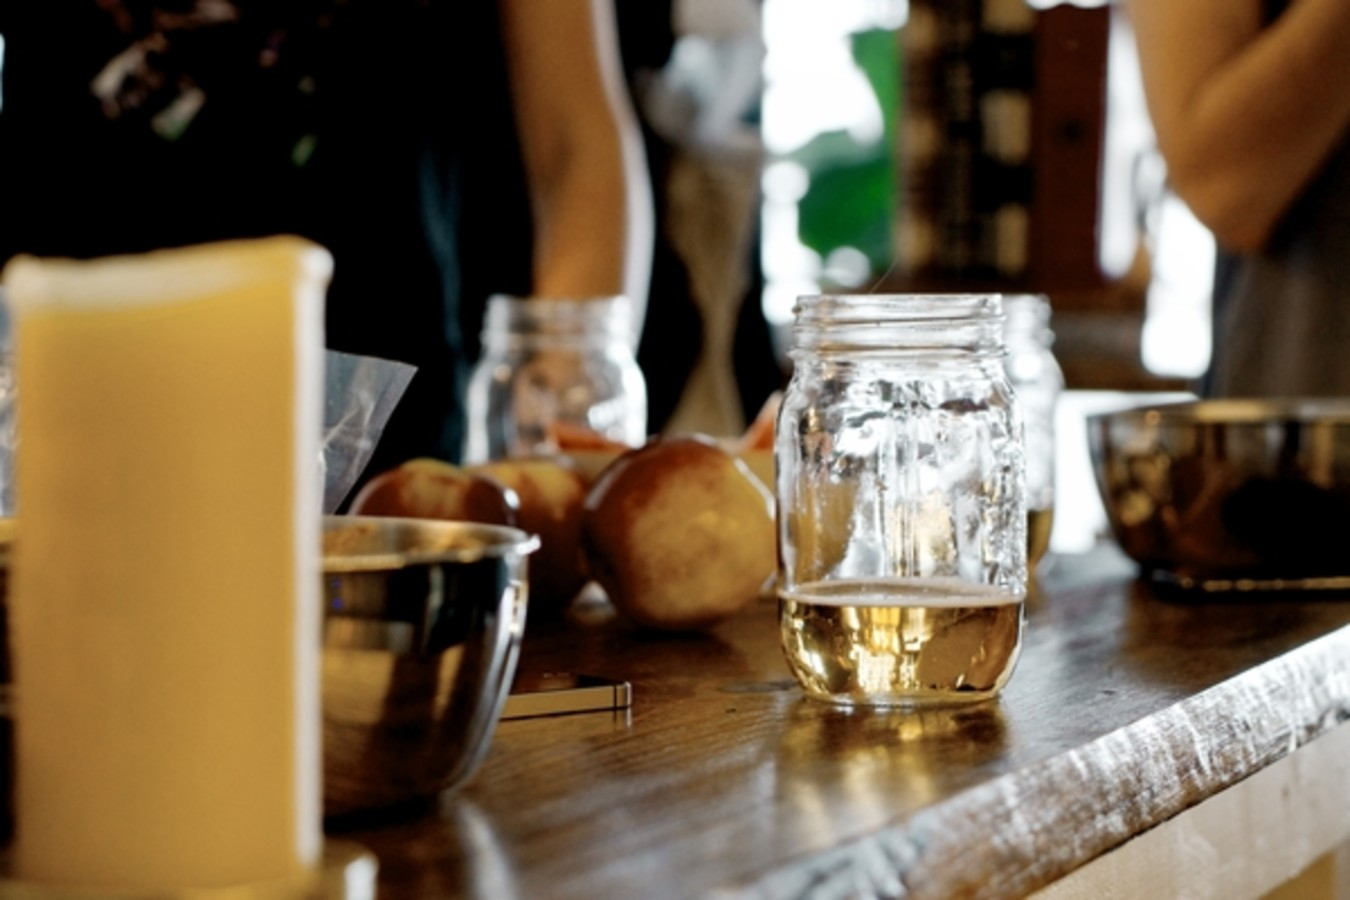 mason jar with cider